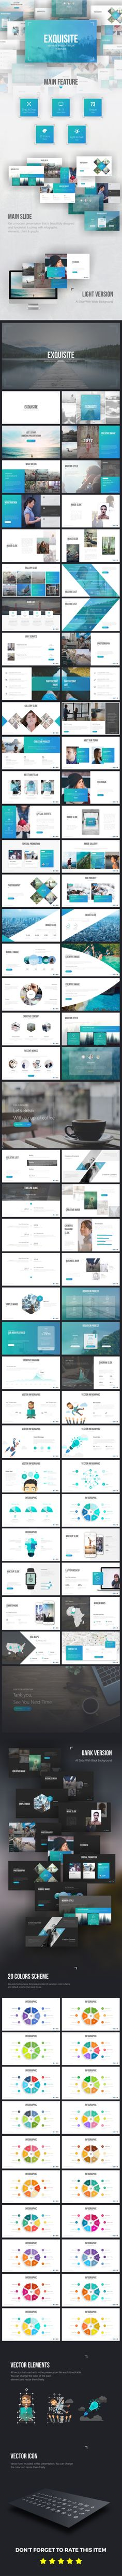 iOS 9 Style PowerPoint Template | iOS, Kreativ und Füchse